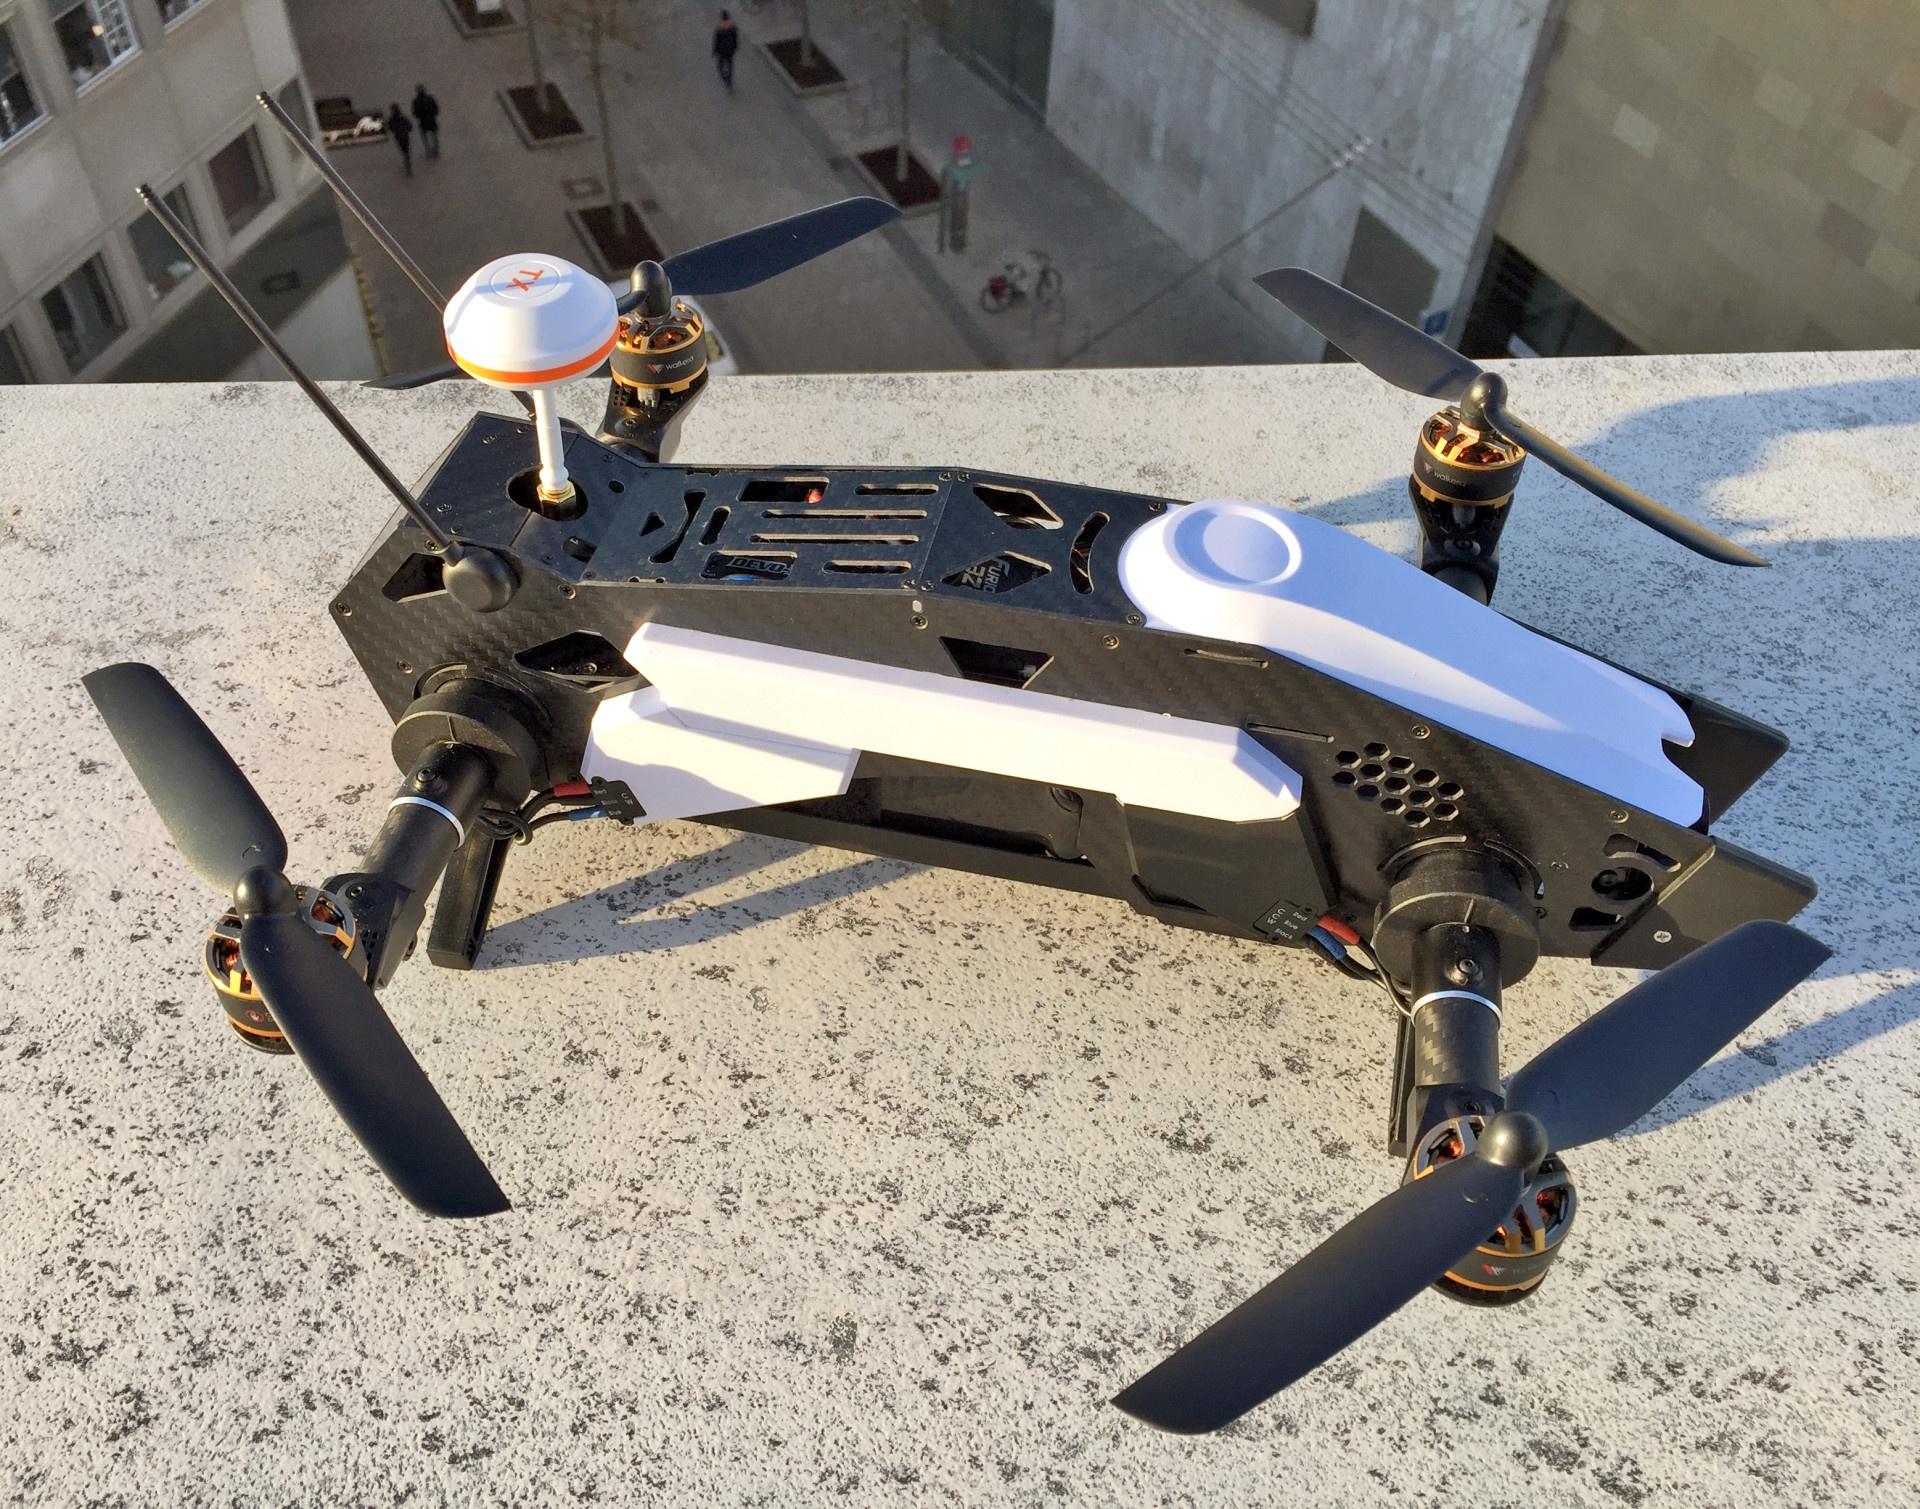 Furious 320 Gps Erster Flugeindruck Walkera Fans Drone Voyager 3 Devo F12e G 3d Gimbal Ilook With Camera Putih